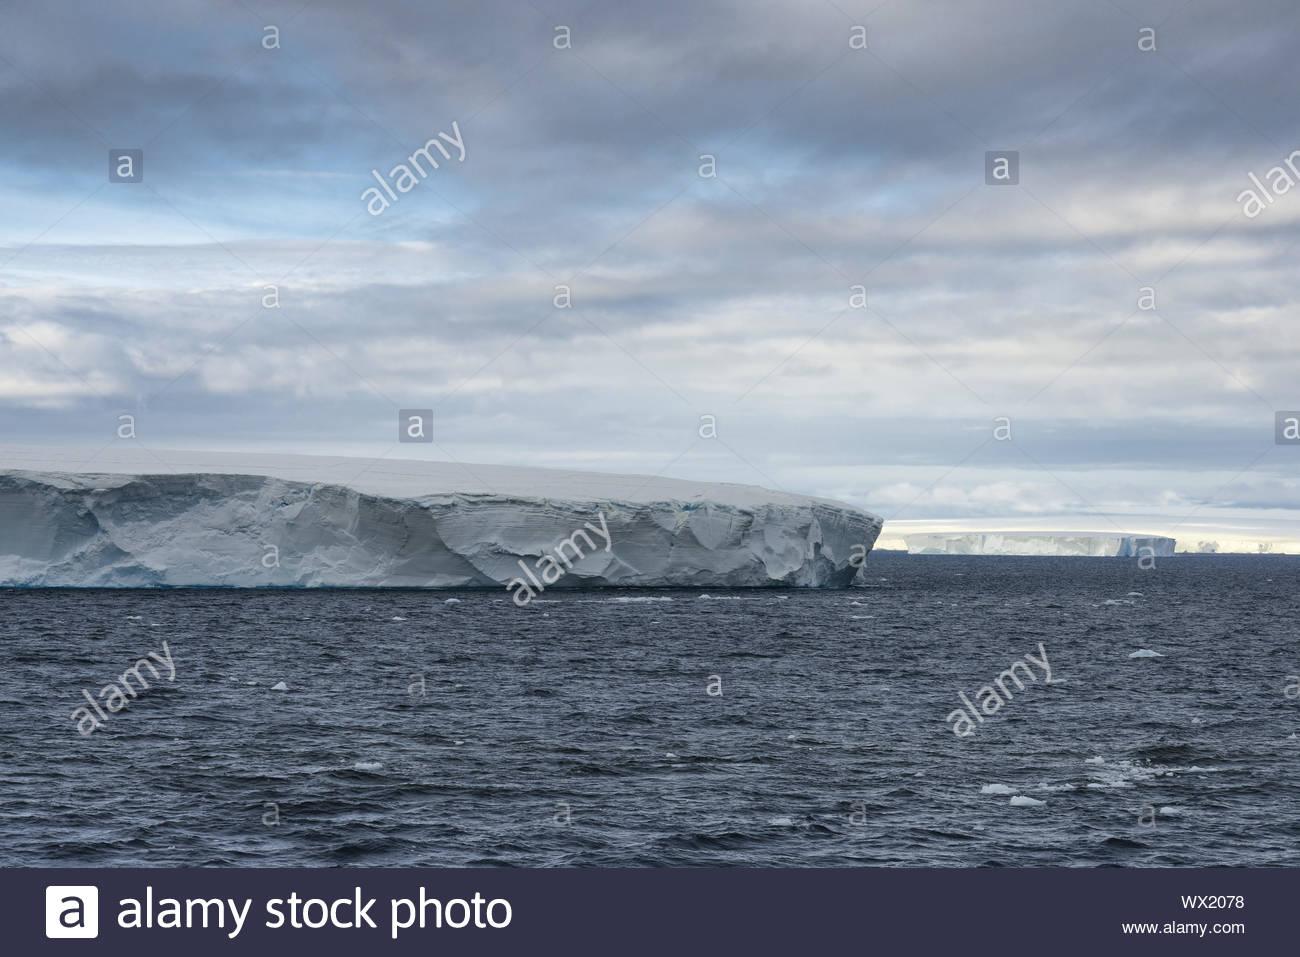 Huge Tabular Icebergs floating in Bransfield Strait near the northern tip of the Antarctic Peninsula, Antarctica Stock Photo